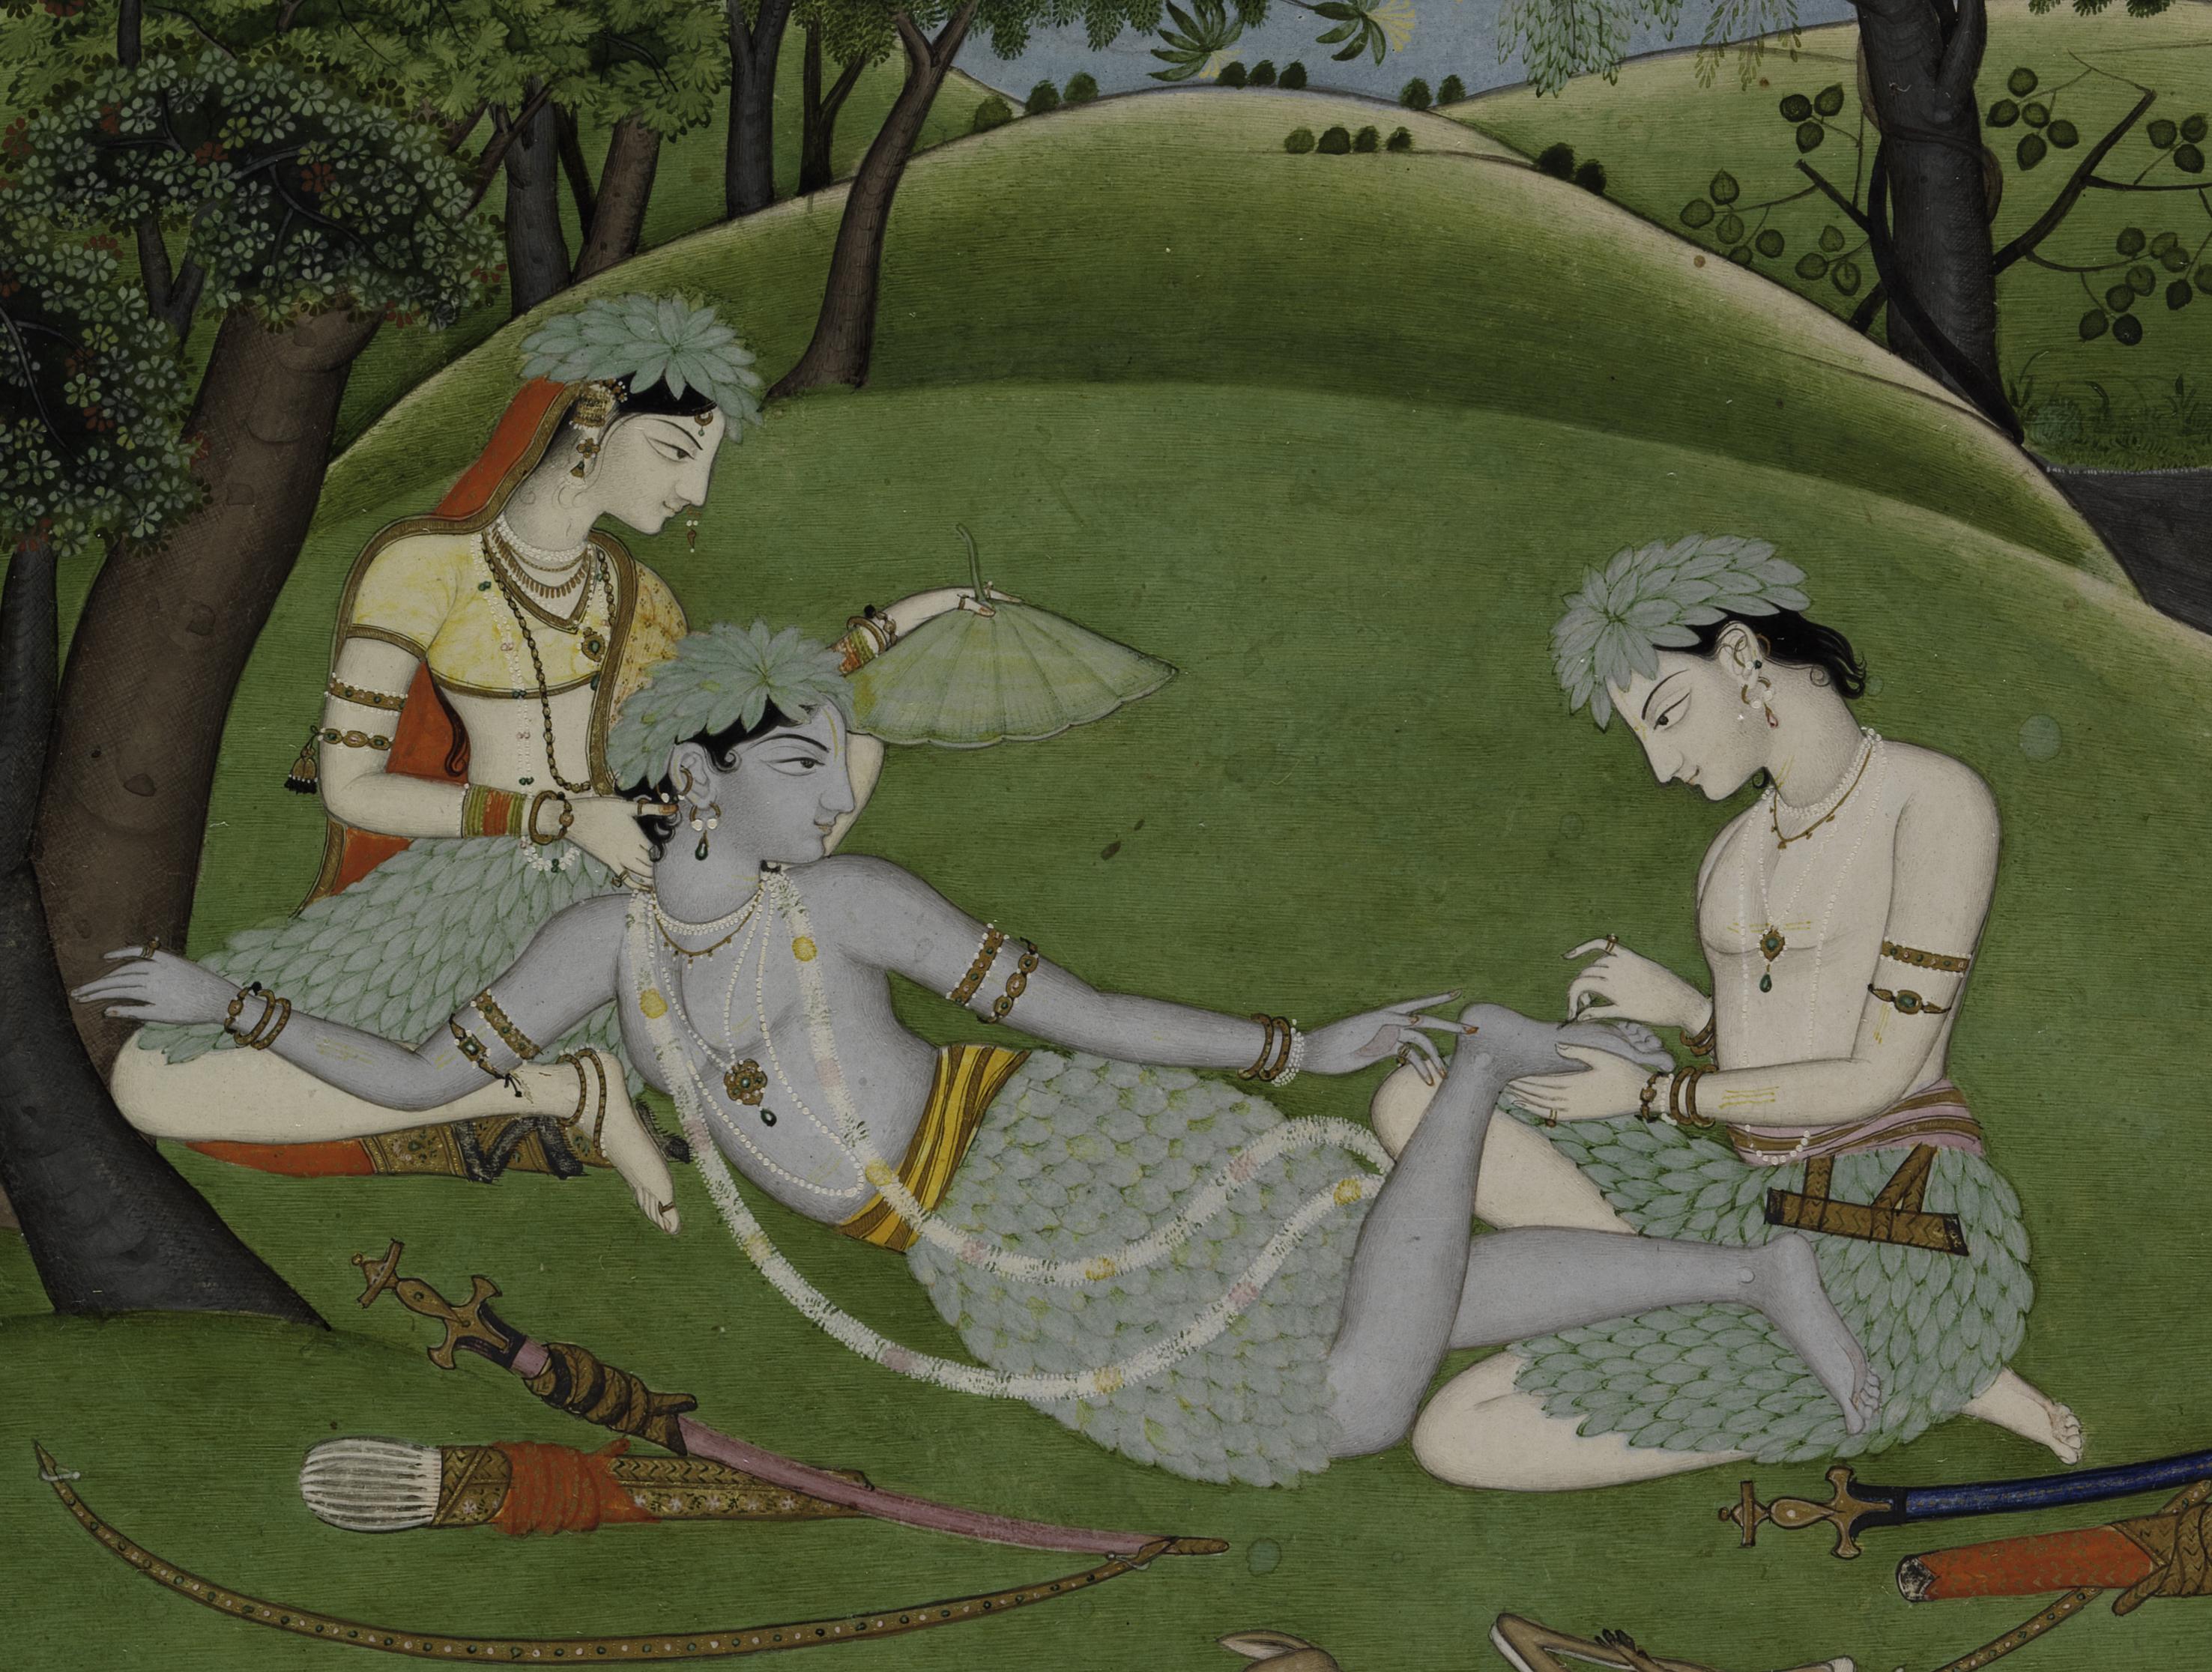 The Metropolitan Museum of Art showcases the Ramayana